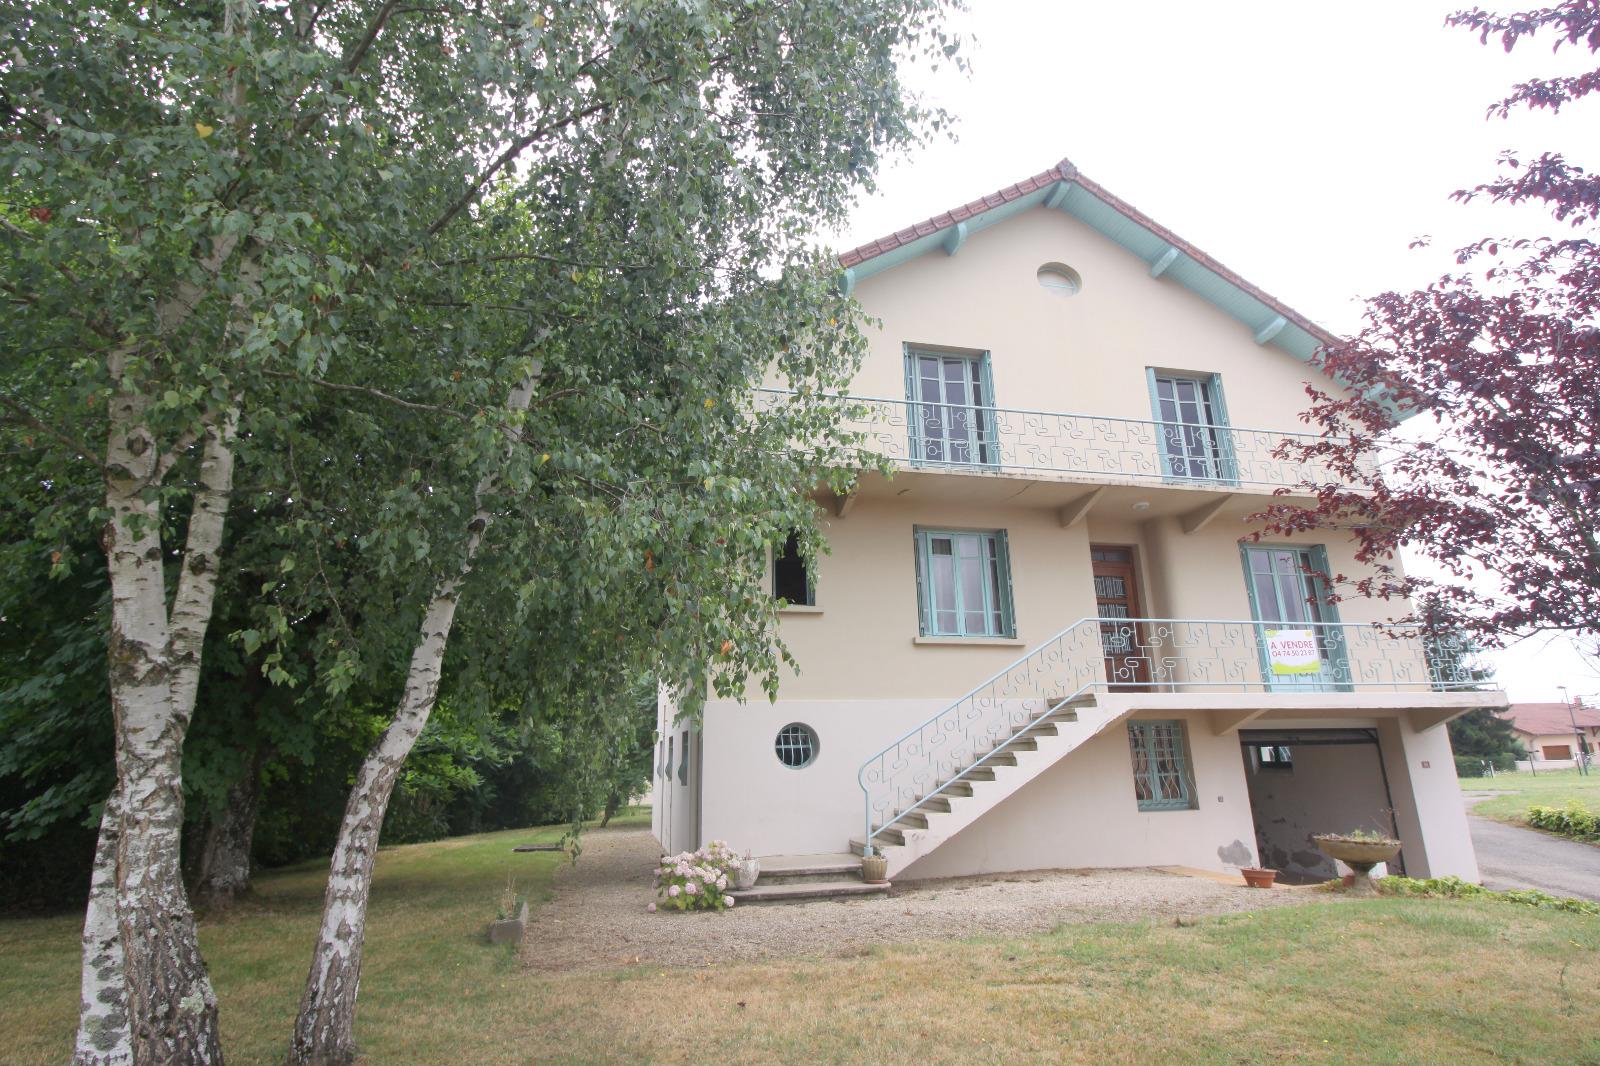 marboz a vendre centre du village maison des ann es 50 immobresse. Black Bedroom Furniture Sets. Home Design Ideas